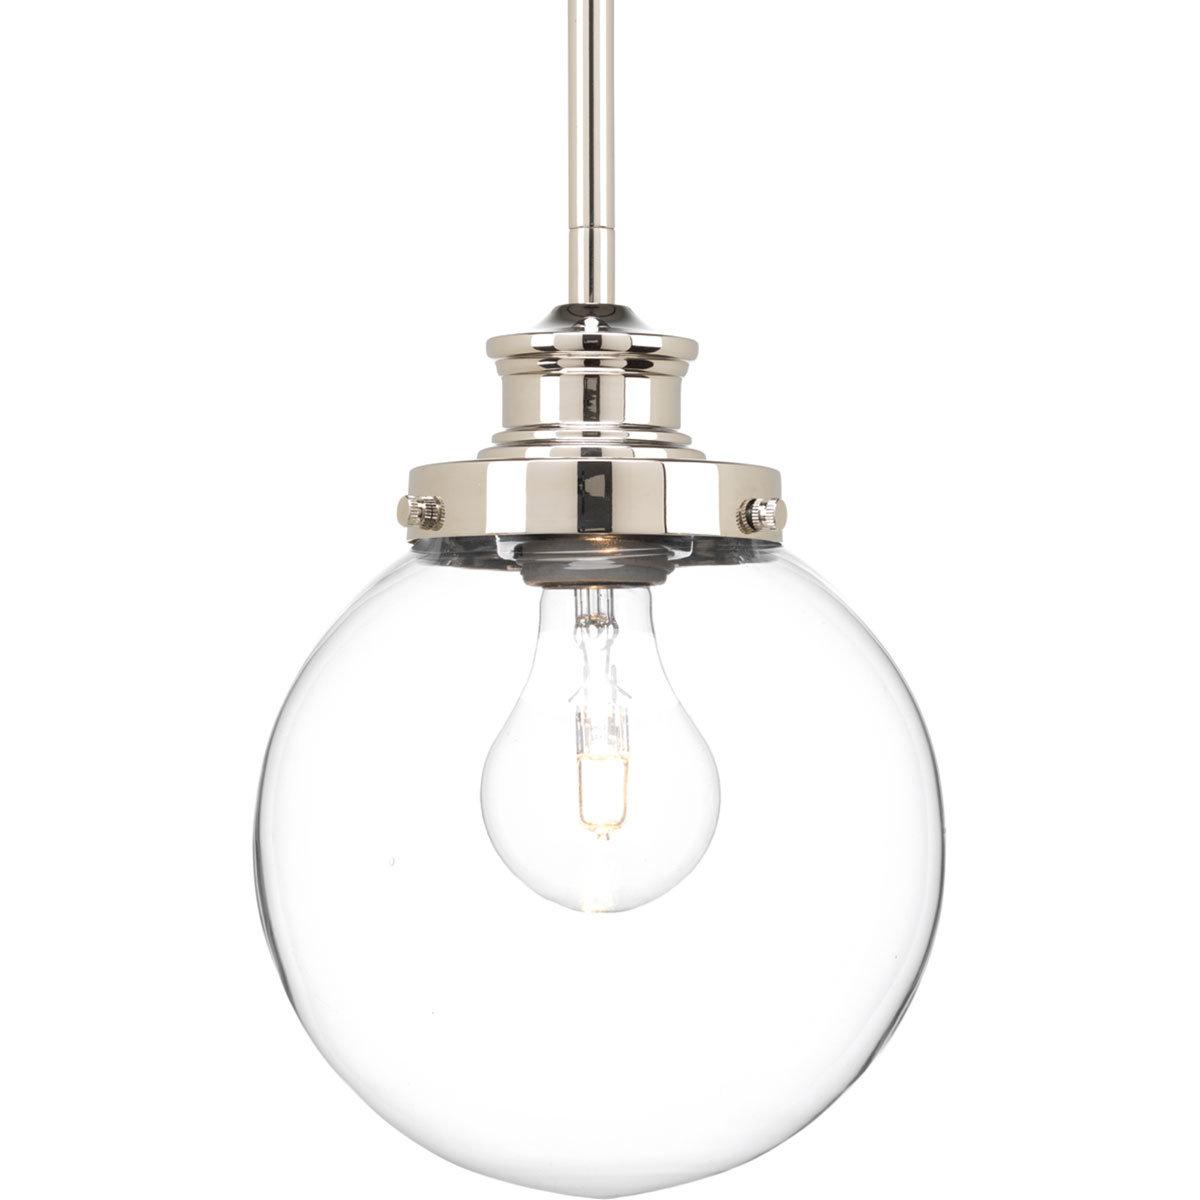 Current Bautista 1 Light Single Globe Pendants For Cayden 1 Light Single Globe Pendant (View 4 of 25)